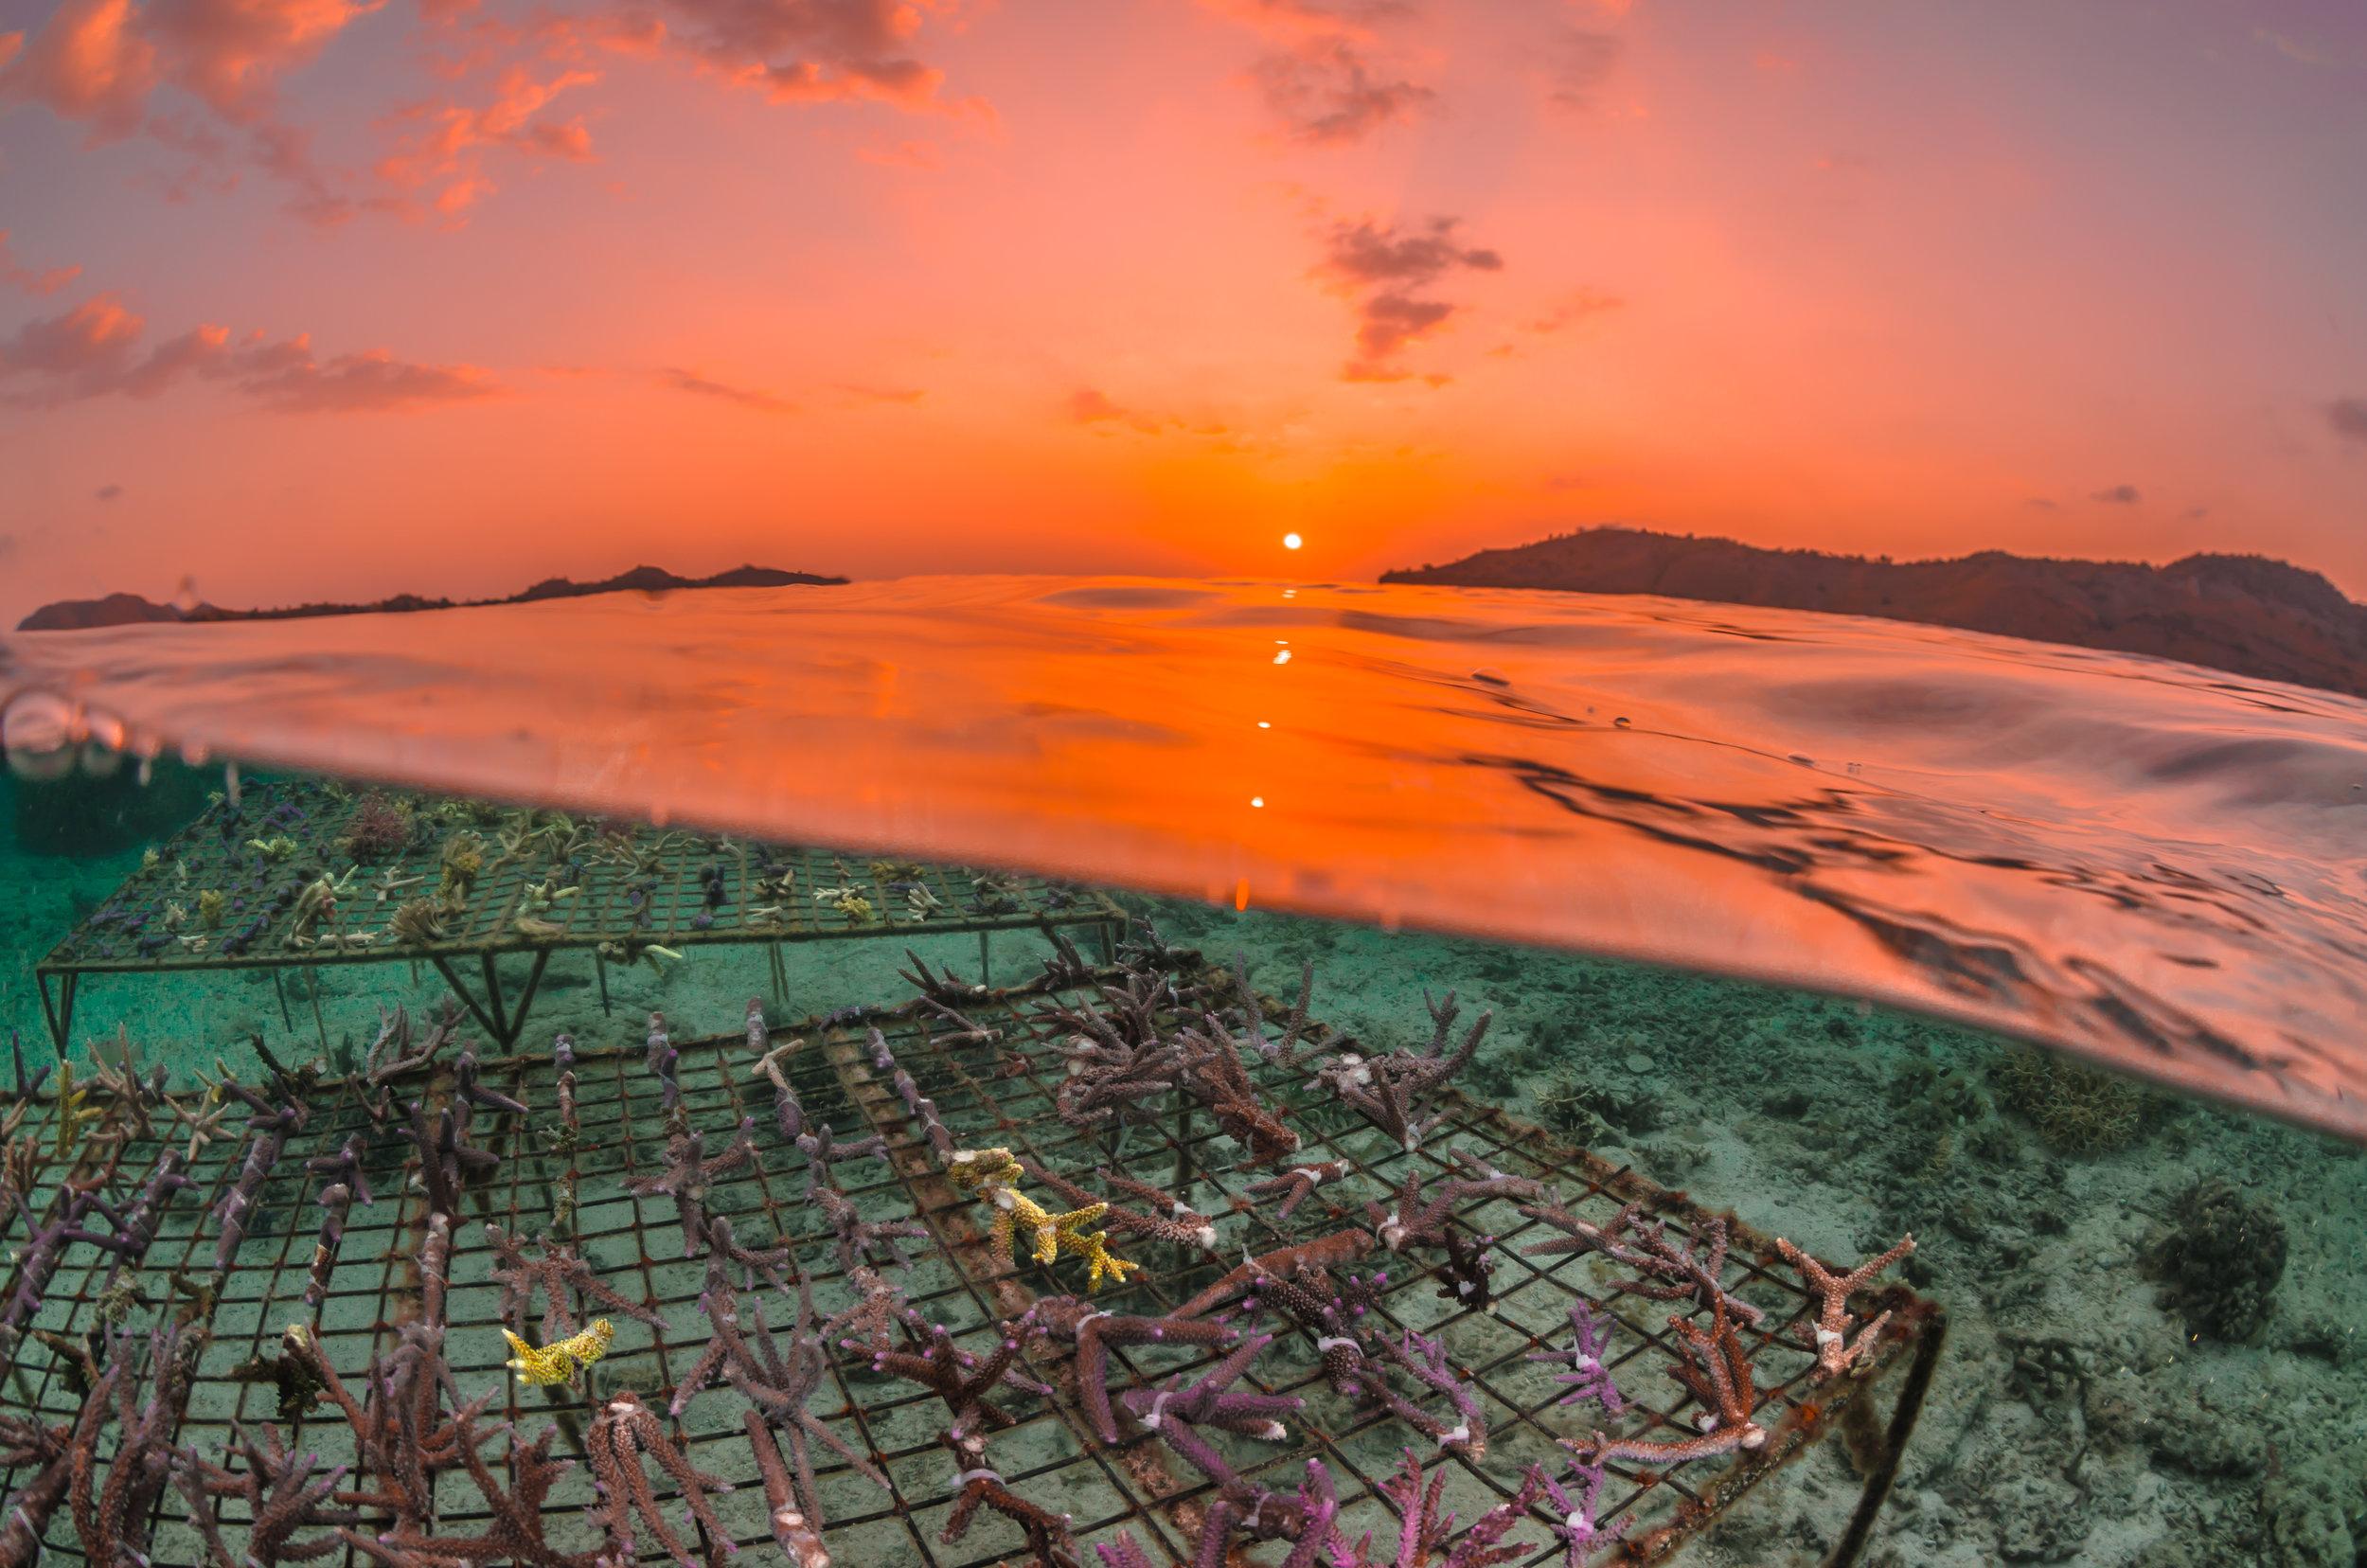 19 - The sun sets over Coral Guardian's nurseries CREDIT: MArtin COLOGNOLI